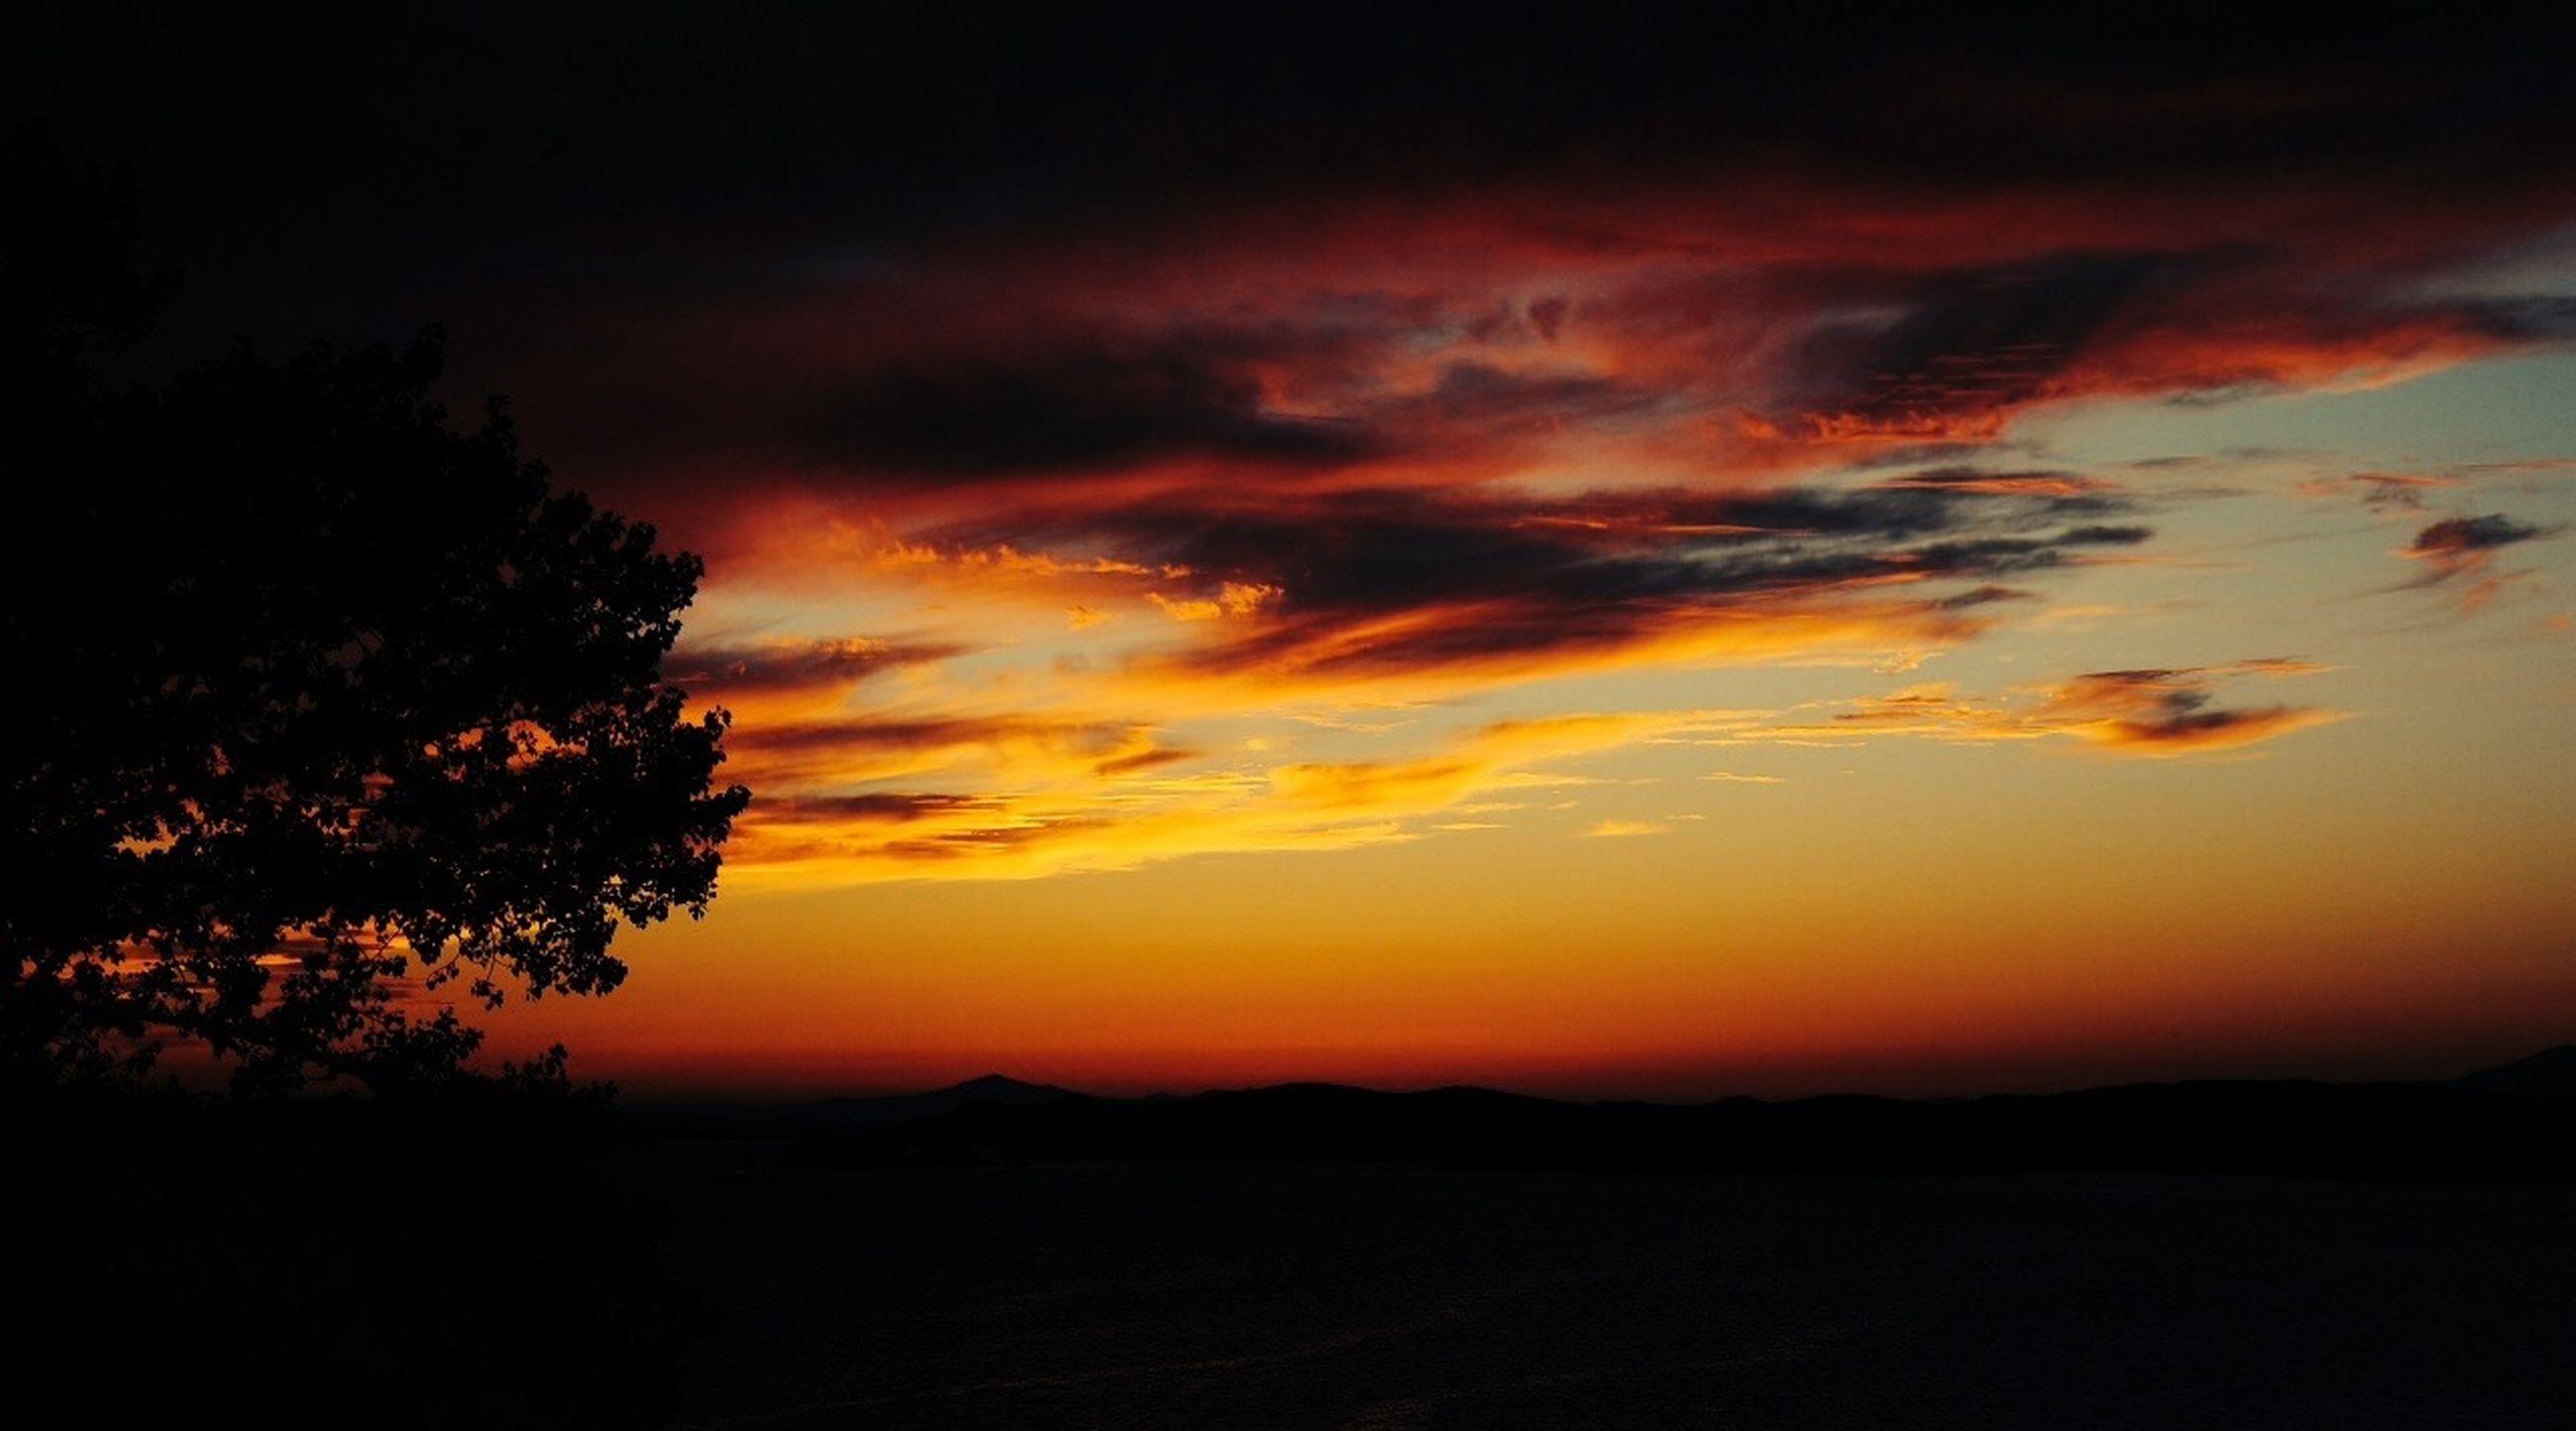 sunset, silhouette, scenics, tranquil scene, beauty in nature, tranquility, orange color, sky, dramatic sky, idyllic, nature, landscape, cloud - sky, majestic, tree, dark, cloud, awe, atmospheric mood, moody sky